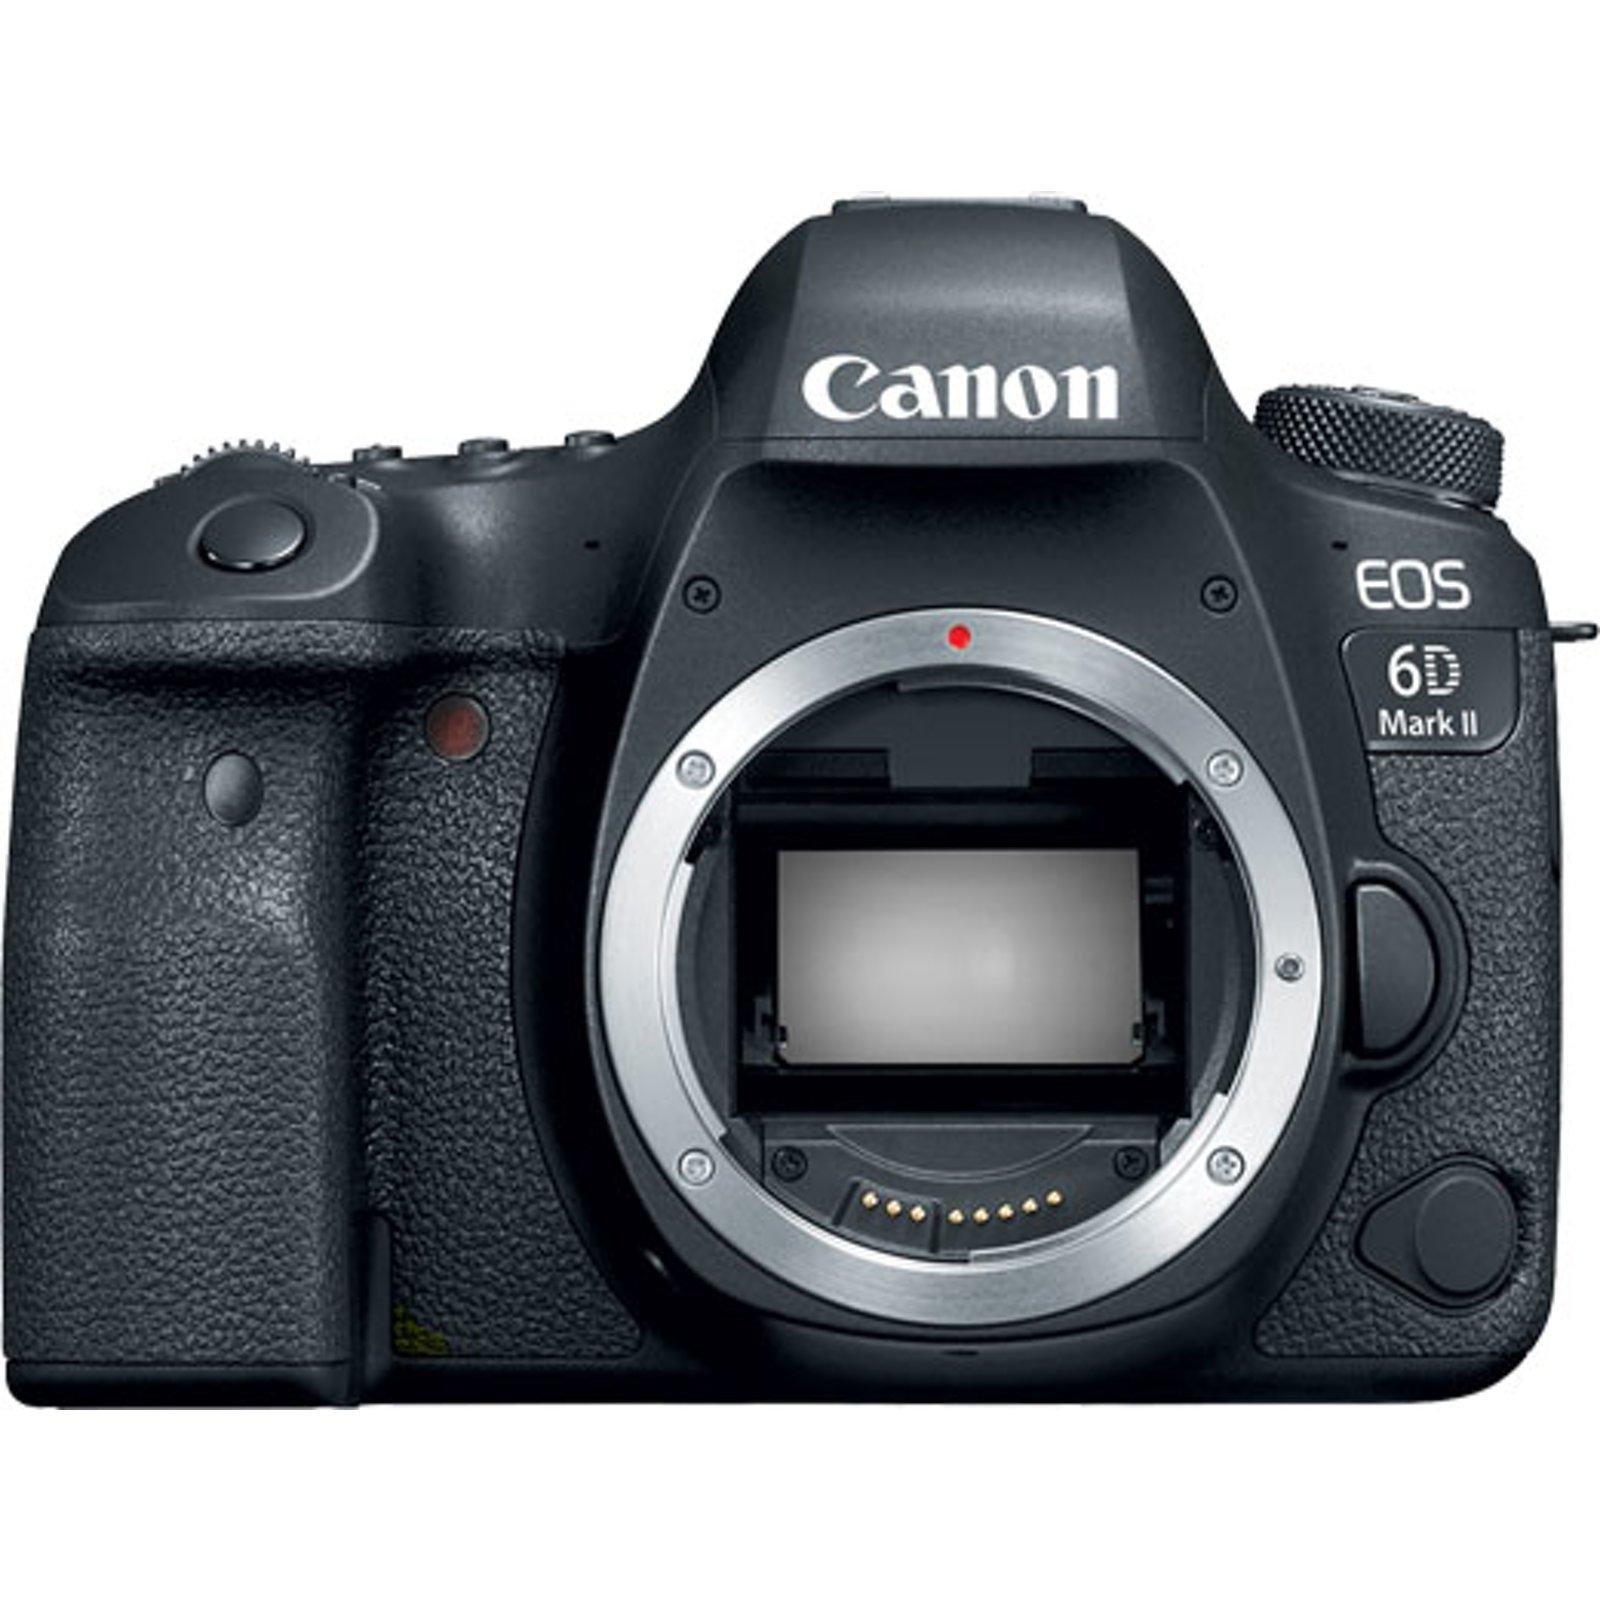 canon 6d mark iii specs image